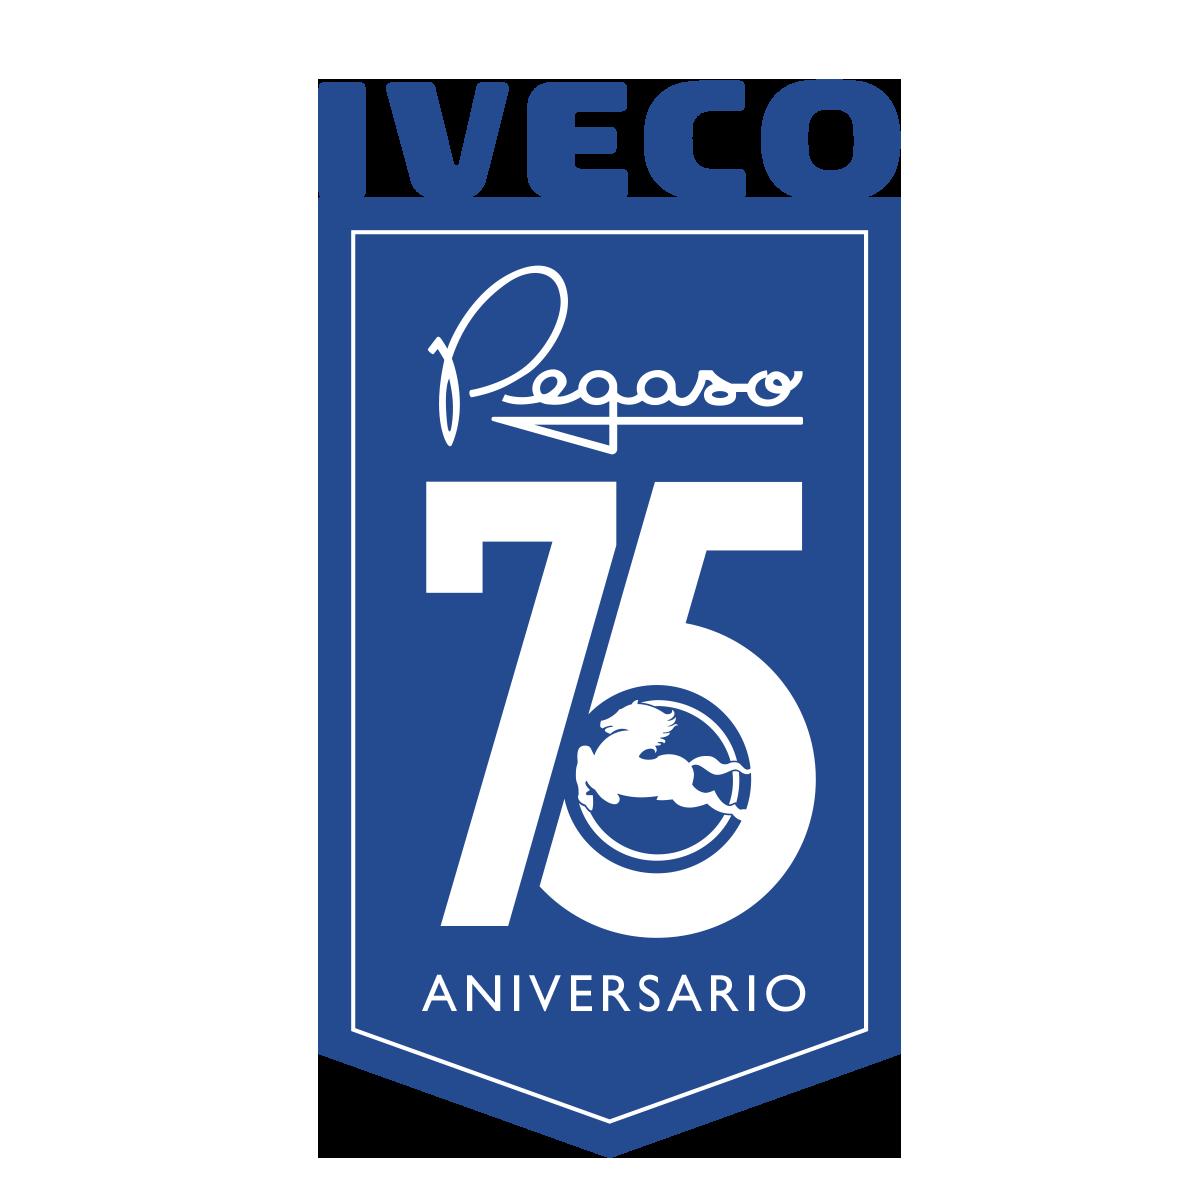 75-летие бренду Pegaso